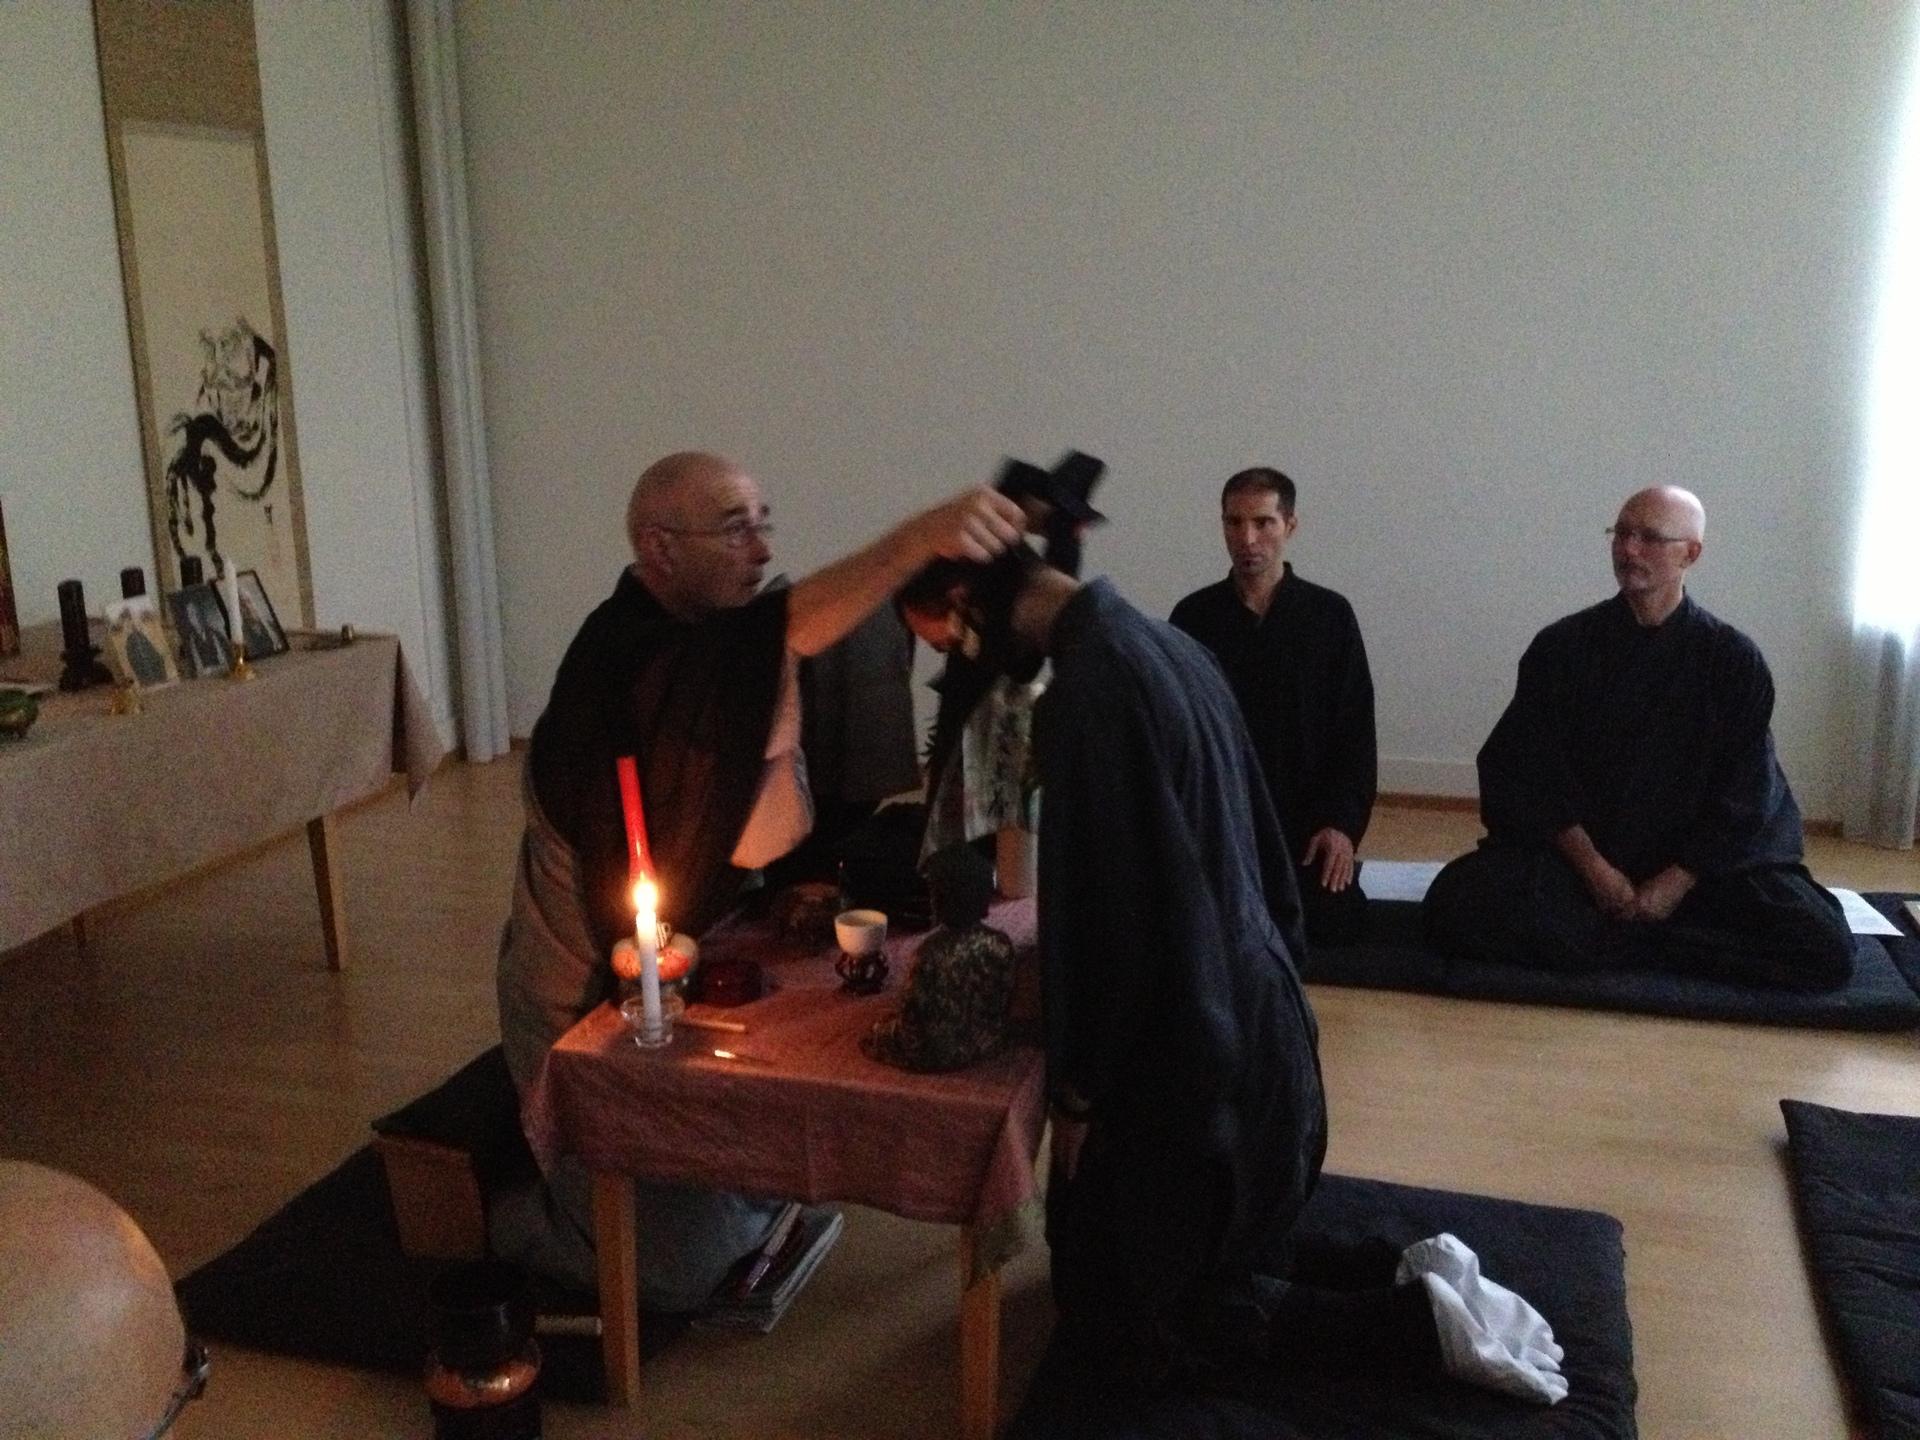 Formally receiving the rakusu with the Dharma name